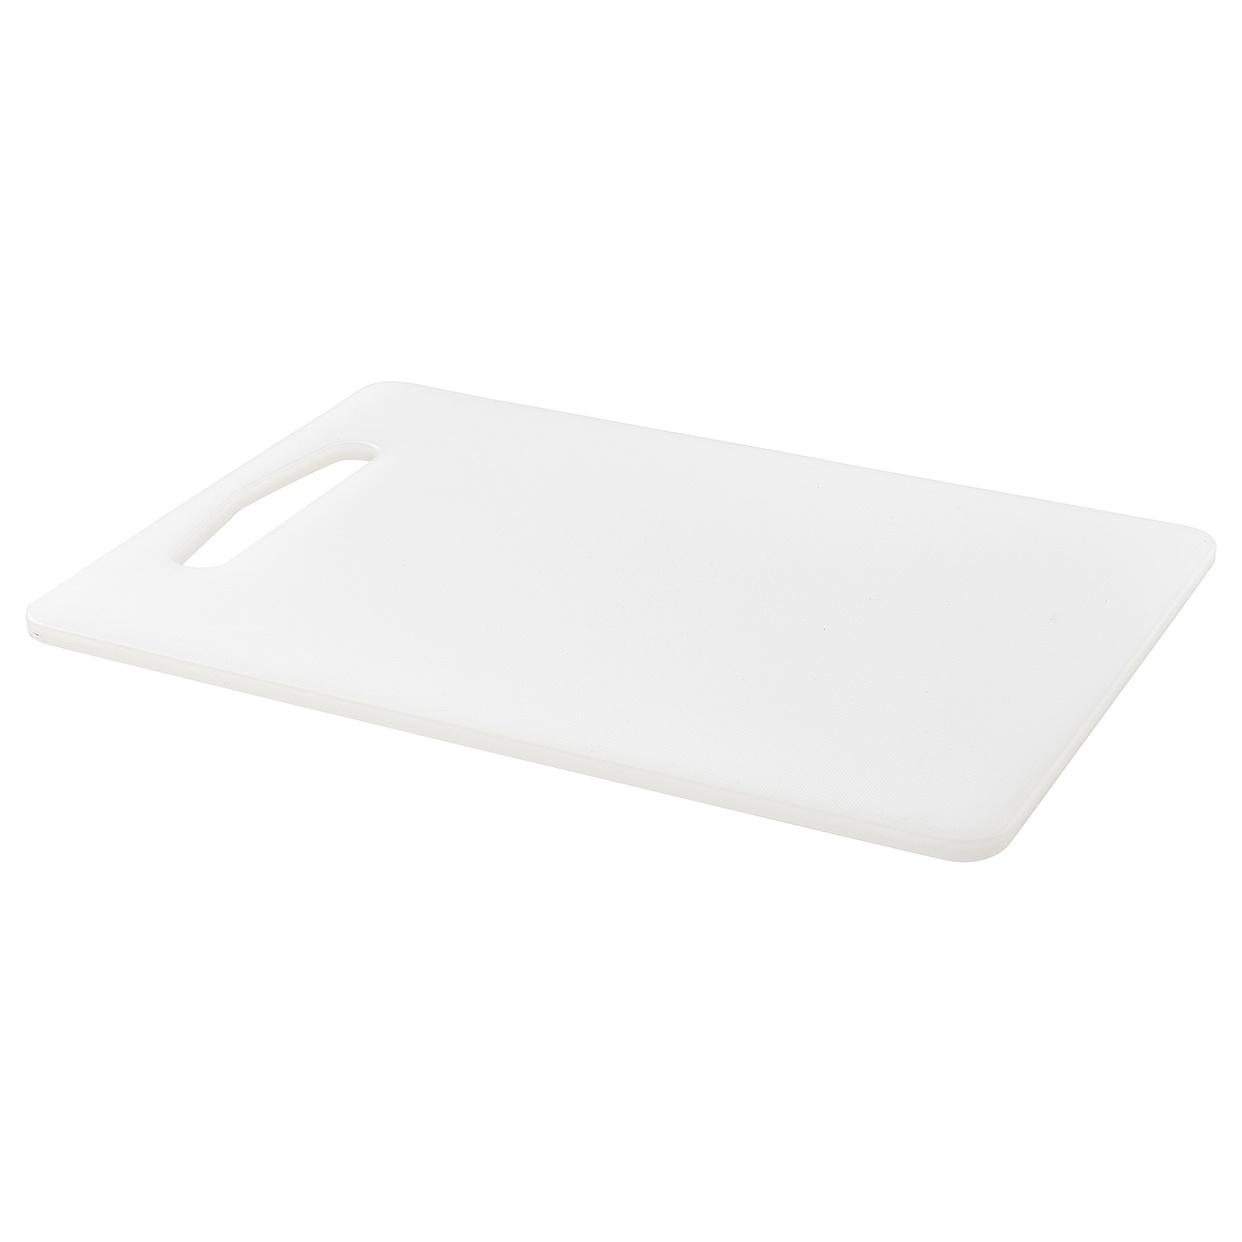 IKEA(イケア) レギティームの商品画像